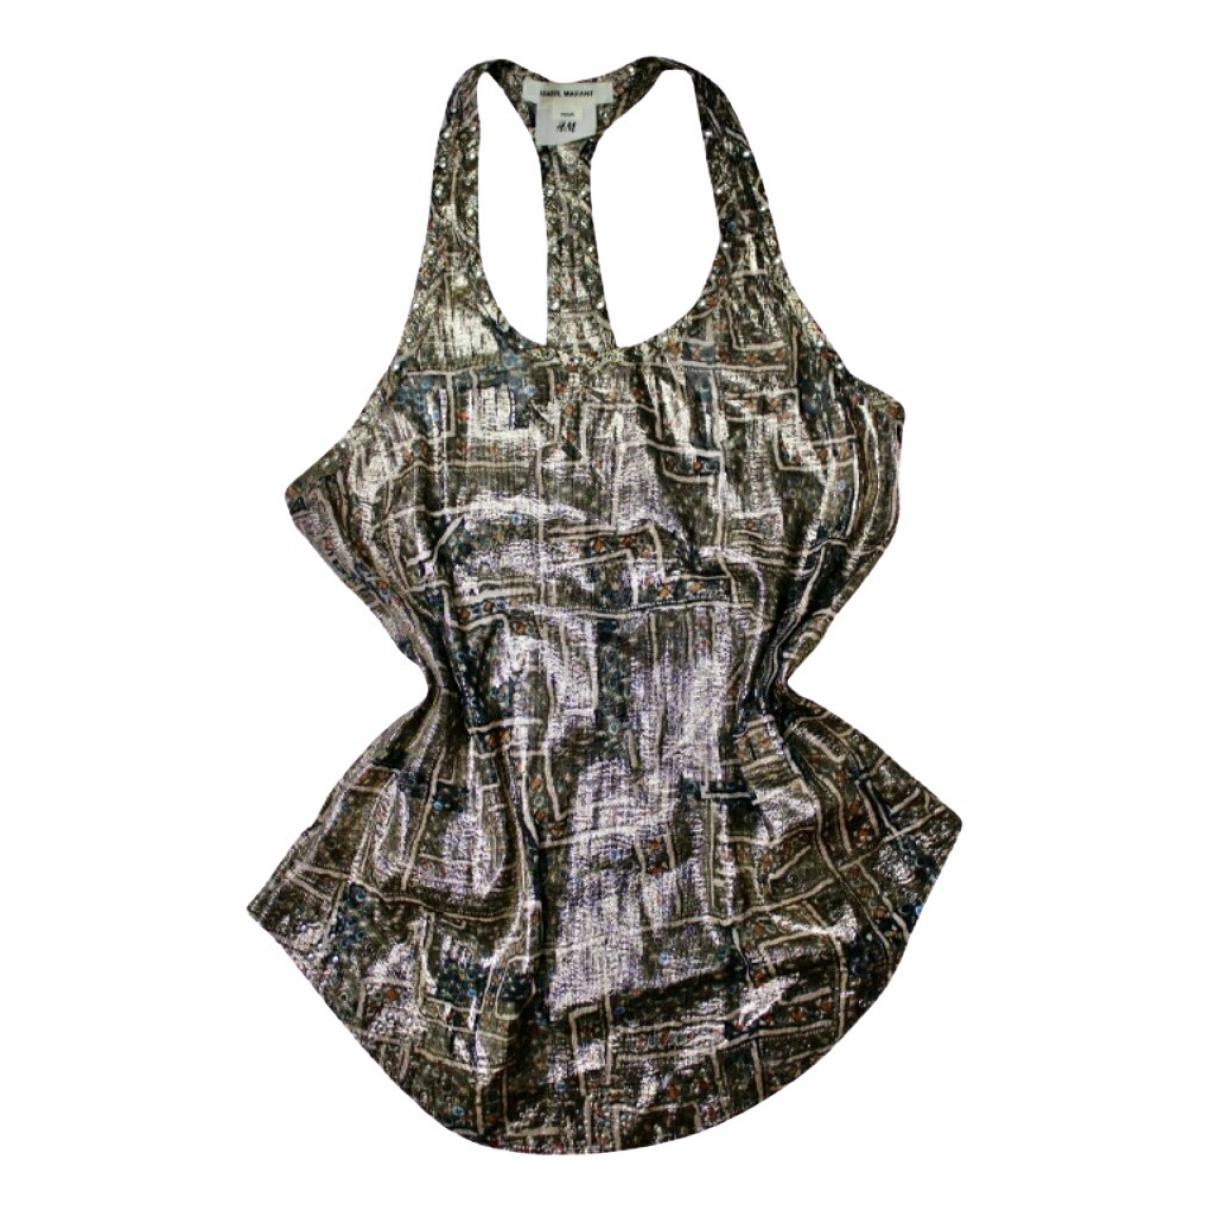 Isabel Marant Pour H&m \N Silk  top for Women M International